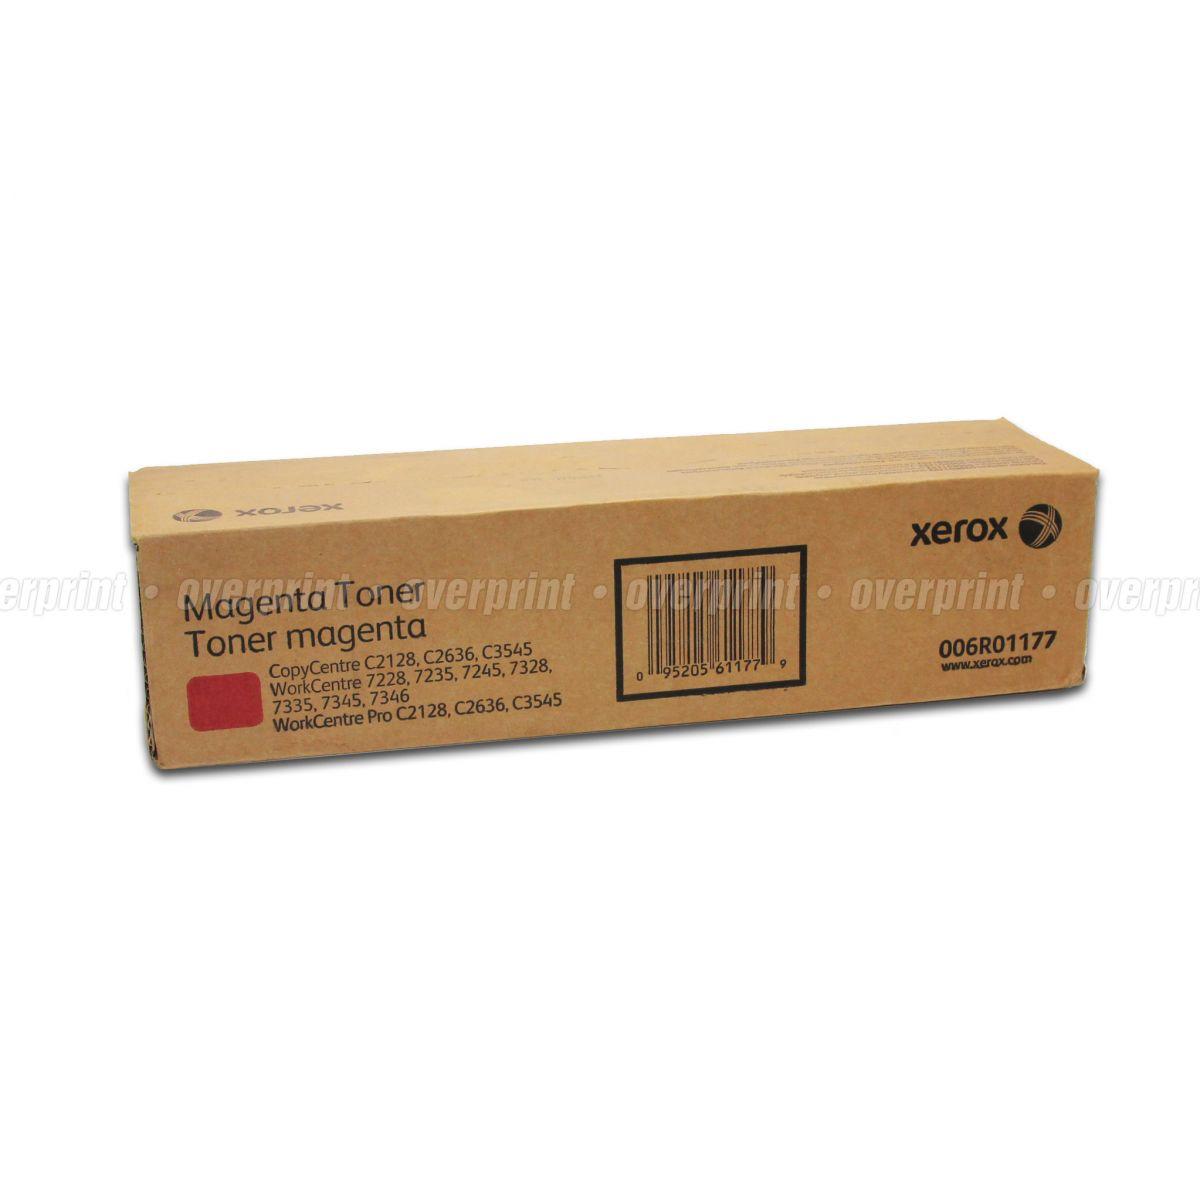 Cartucho Toner Xerox C2128/C2636/C3545/7228/7335 Original  - Overprint